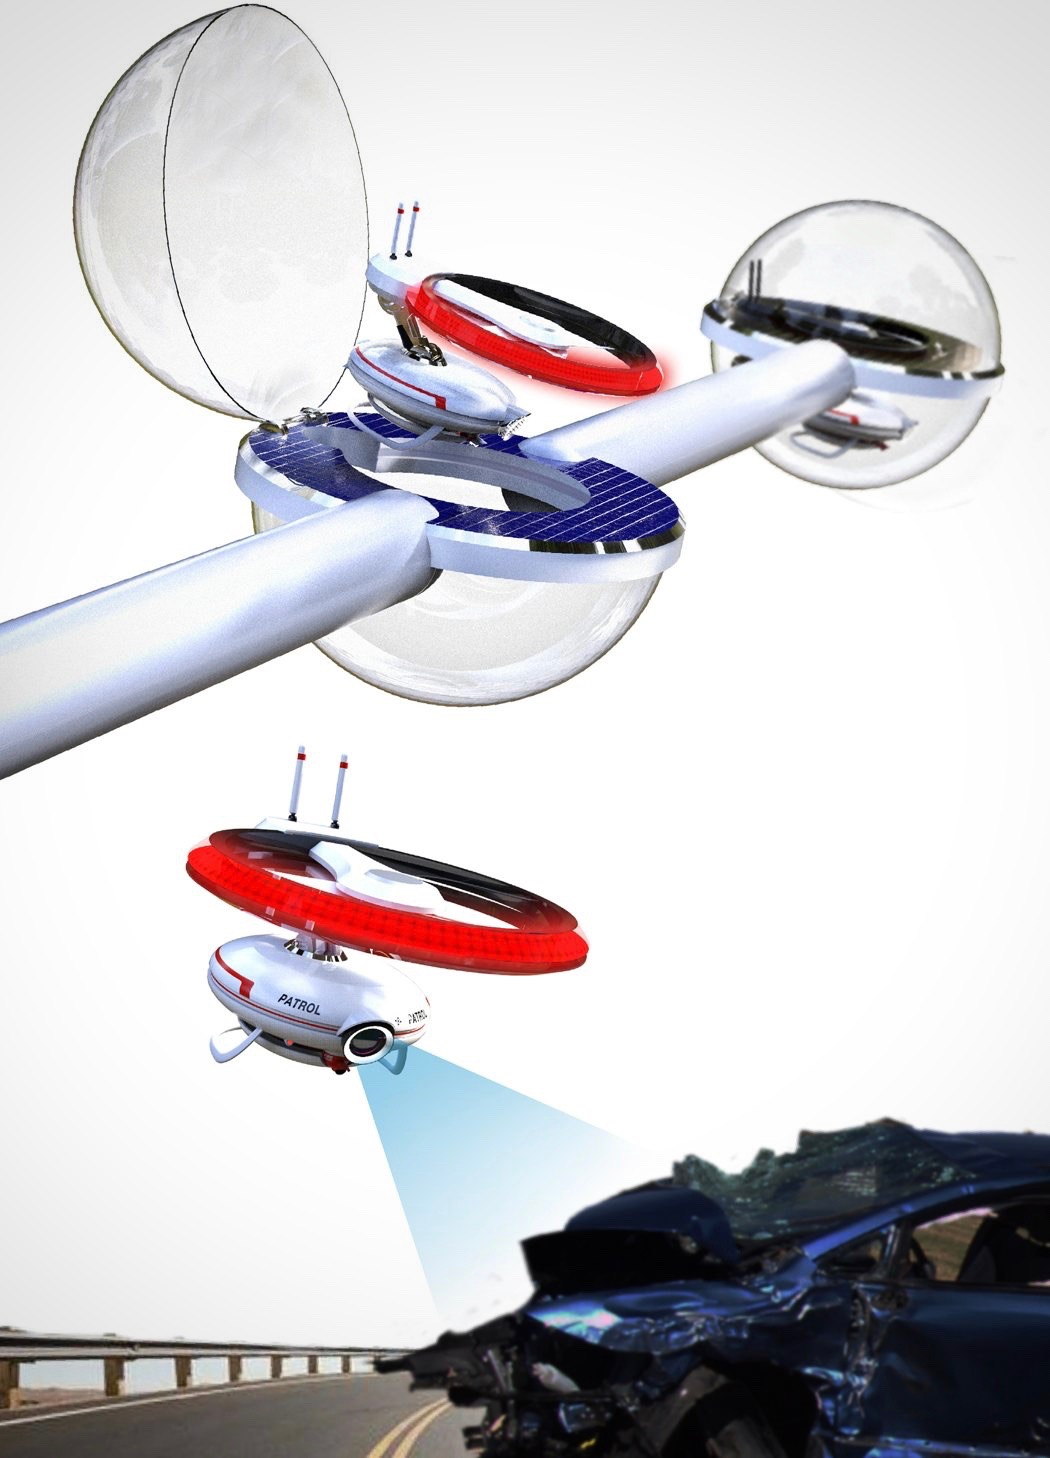 highway_patrol_drone_02